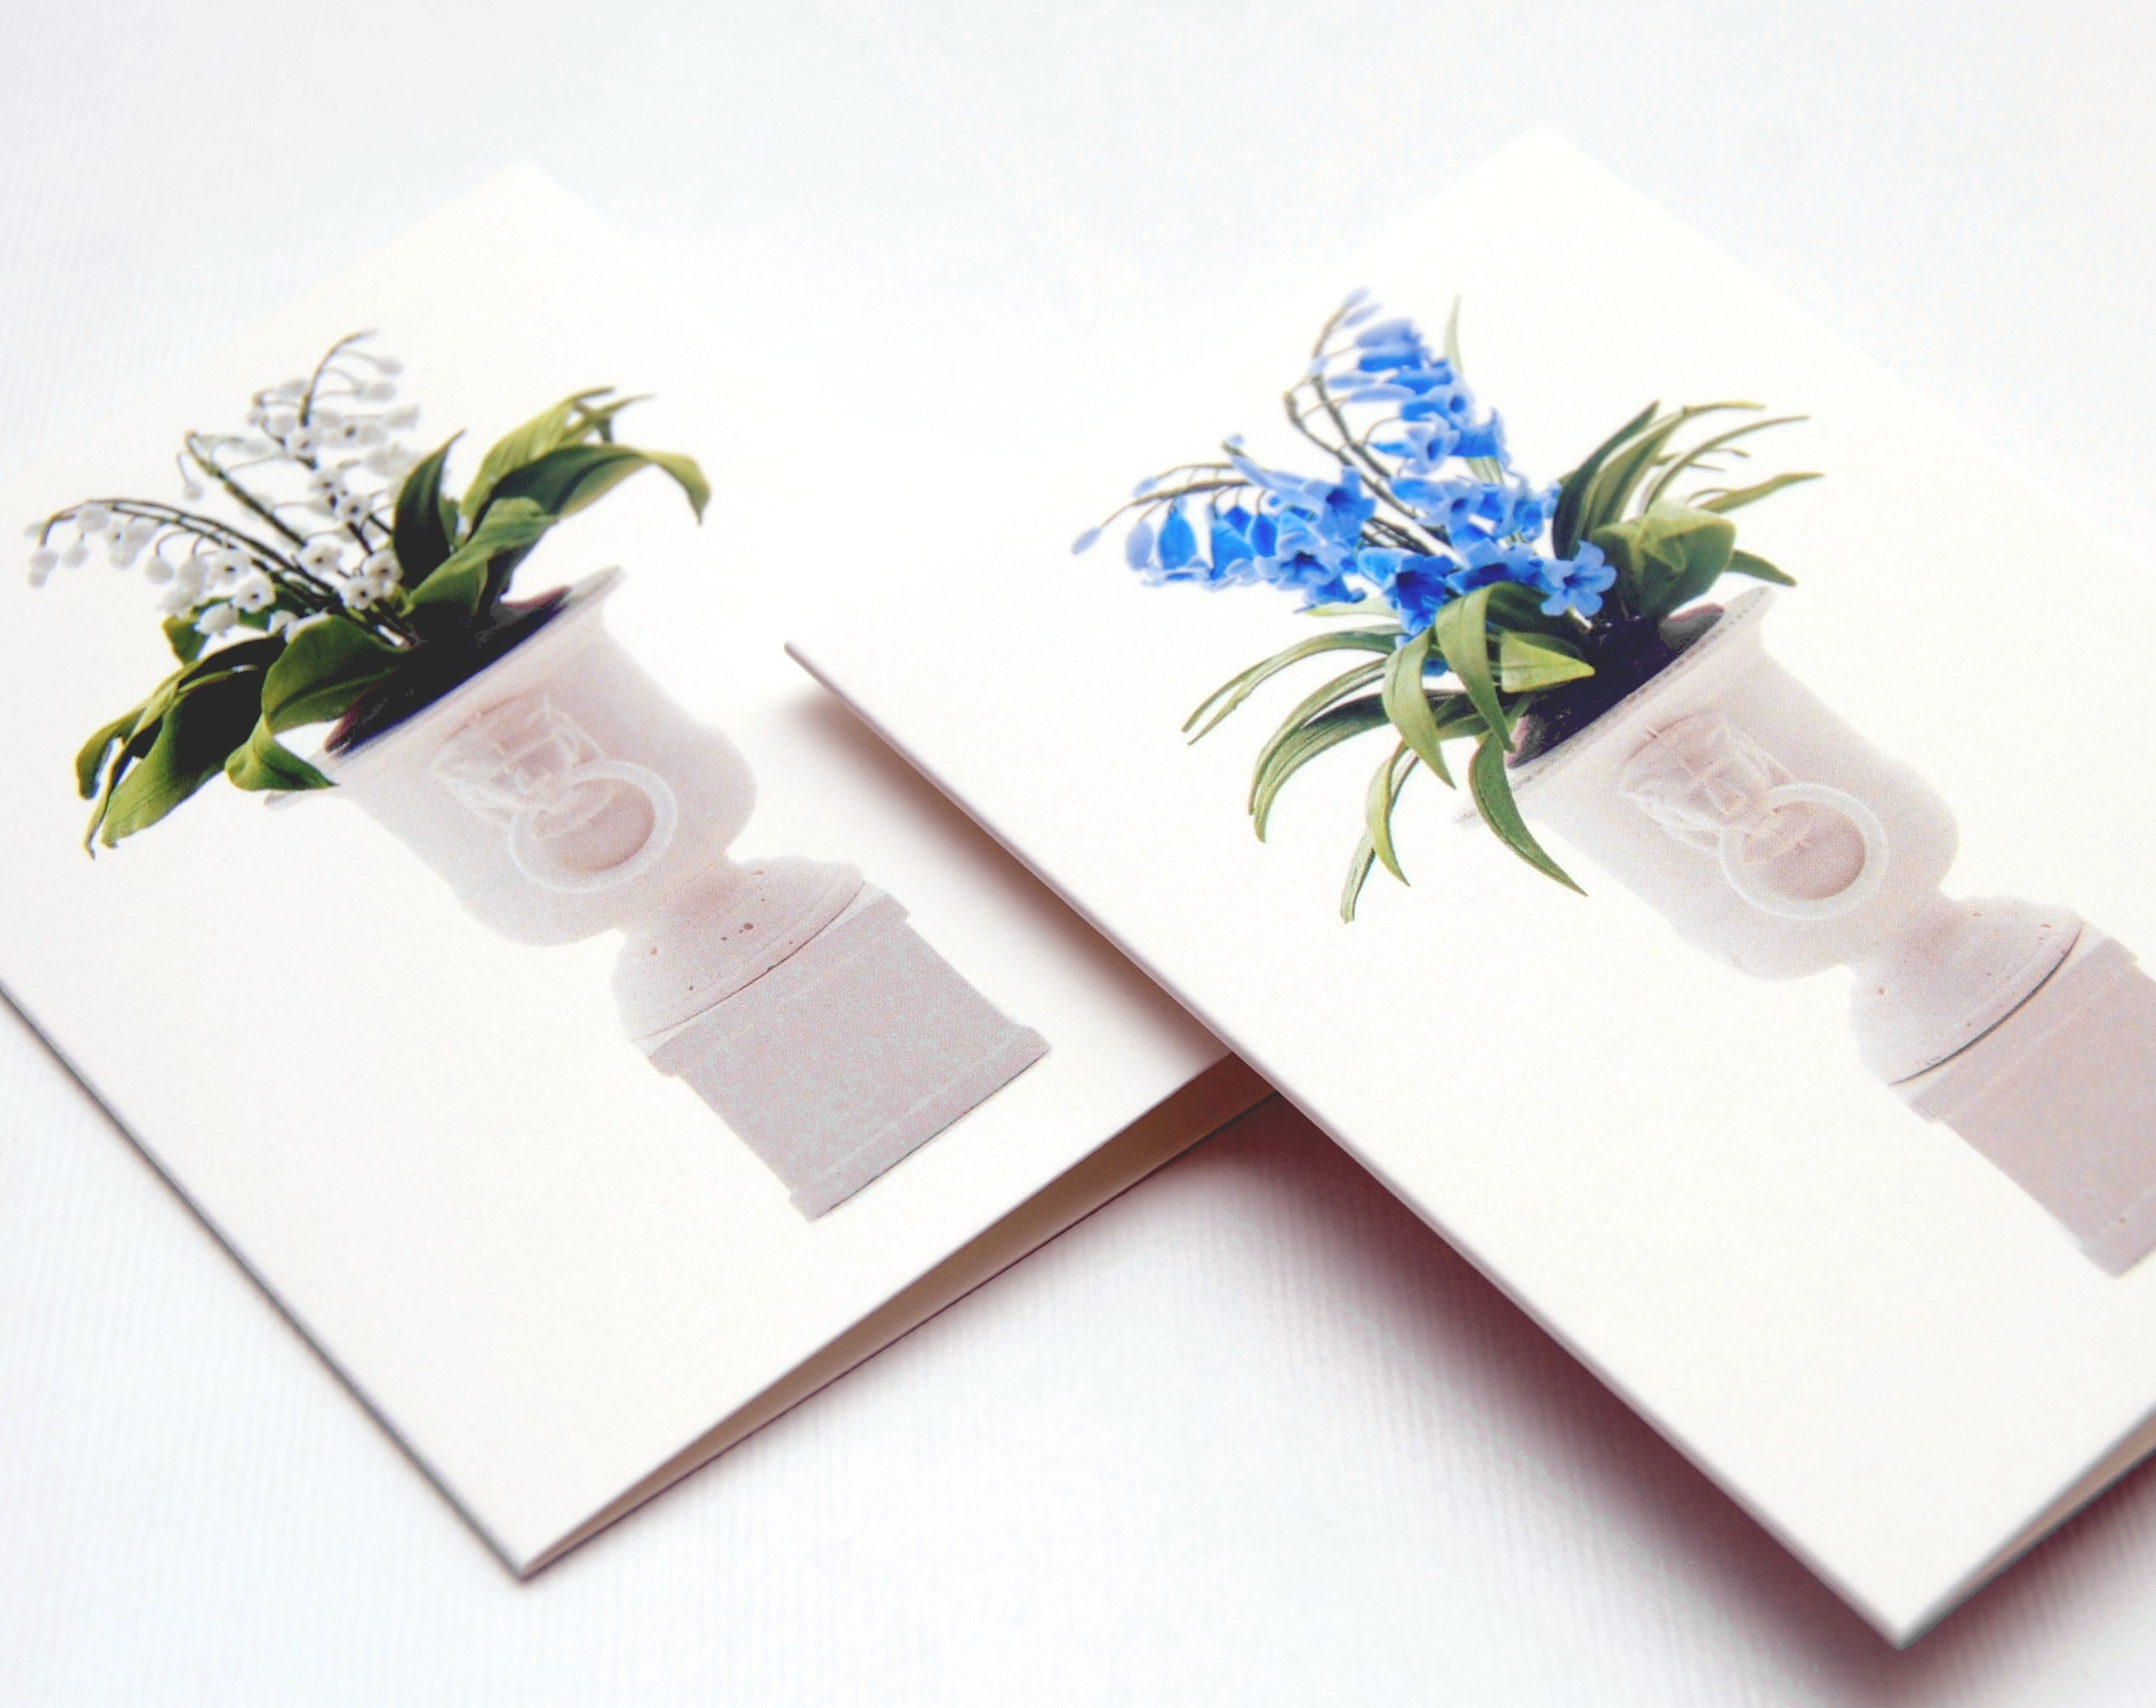 Flower Baskets Crossword Clue : Notecard pack flowers